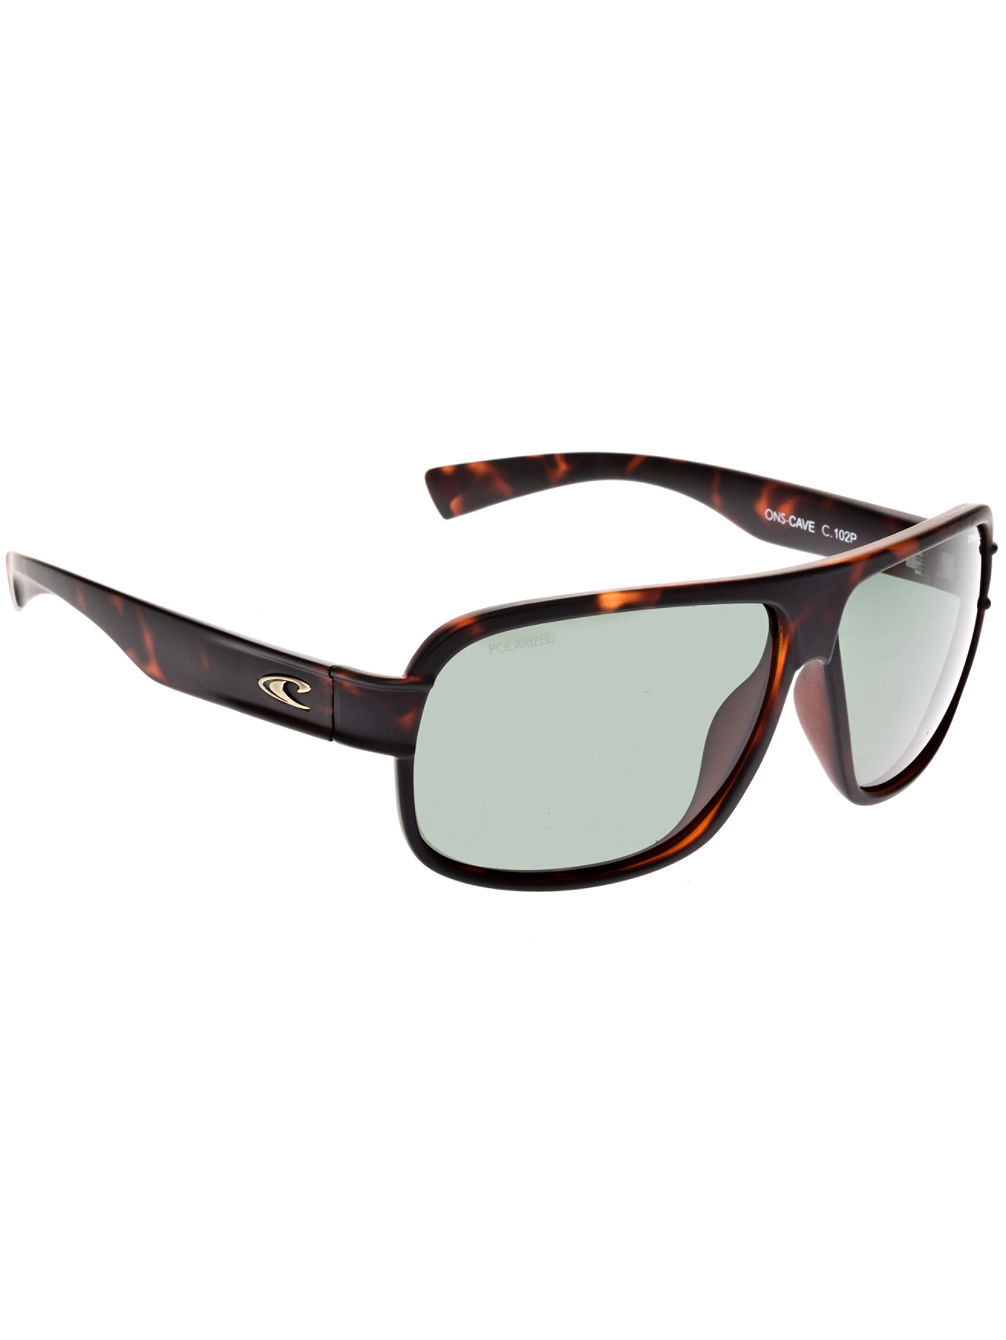 buy o neill eyewear cave shades at blue tomato